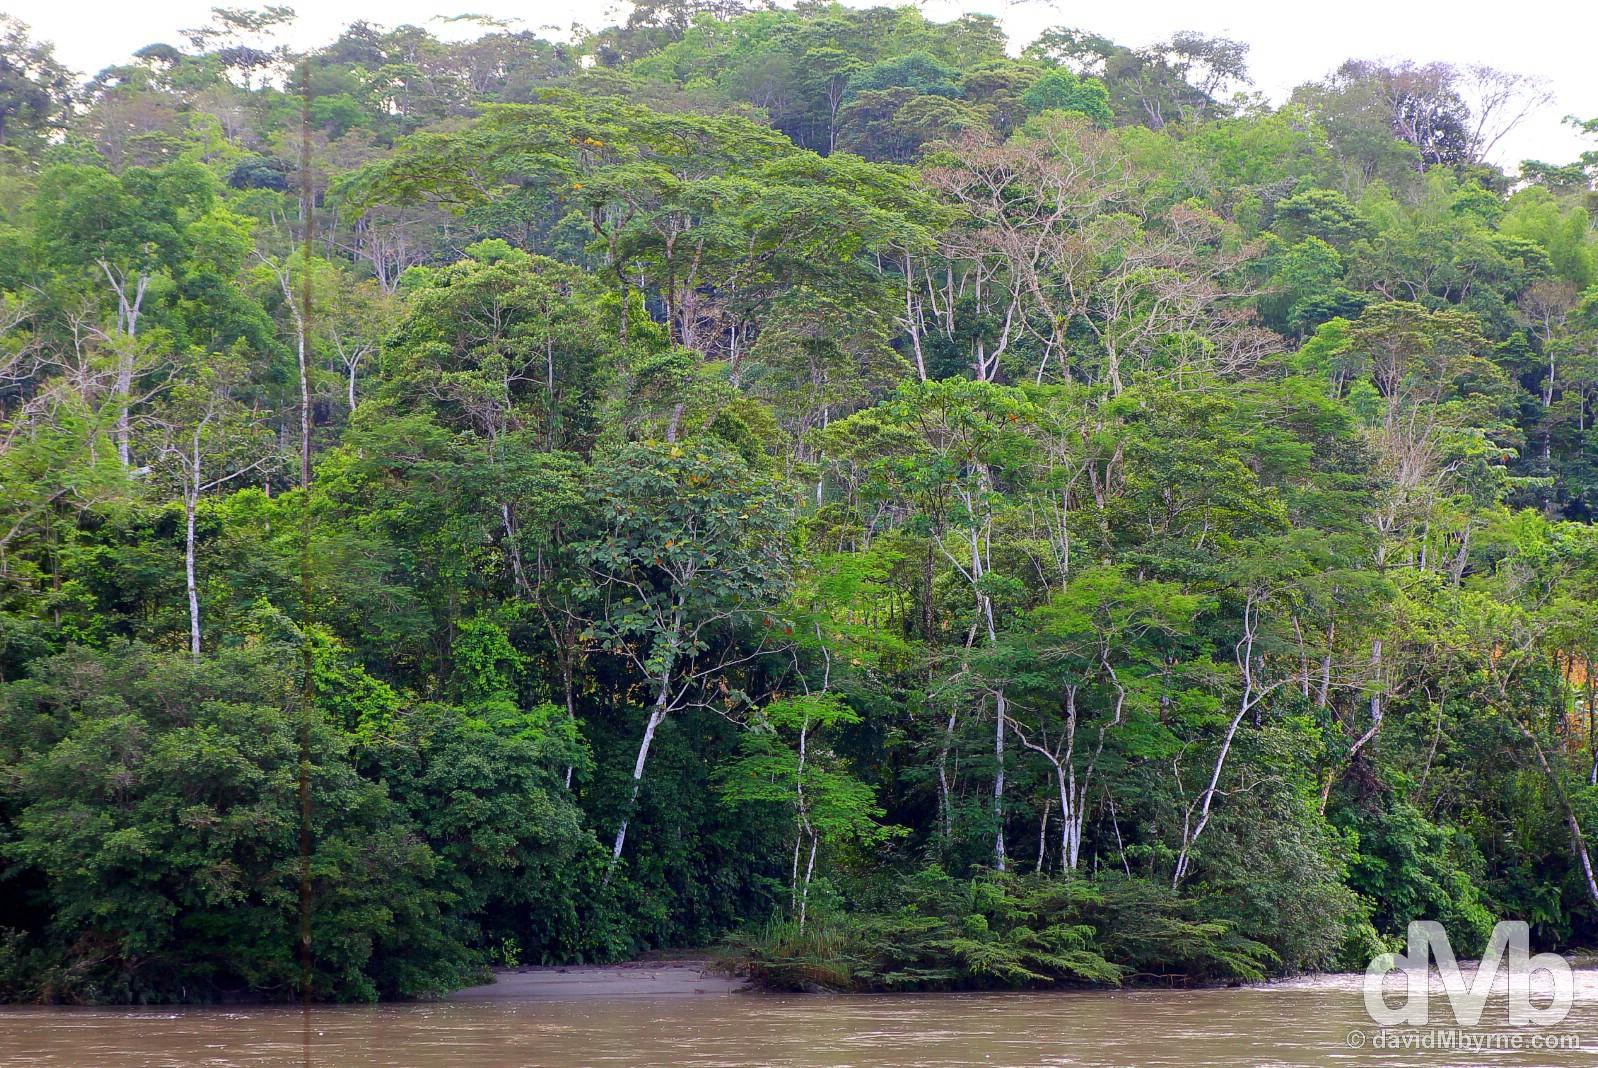 The Ecuadorian rain forest. July 13, 2015.